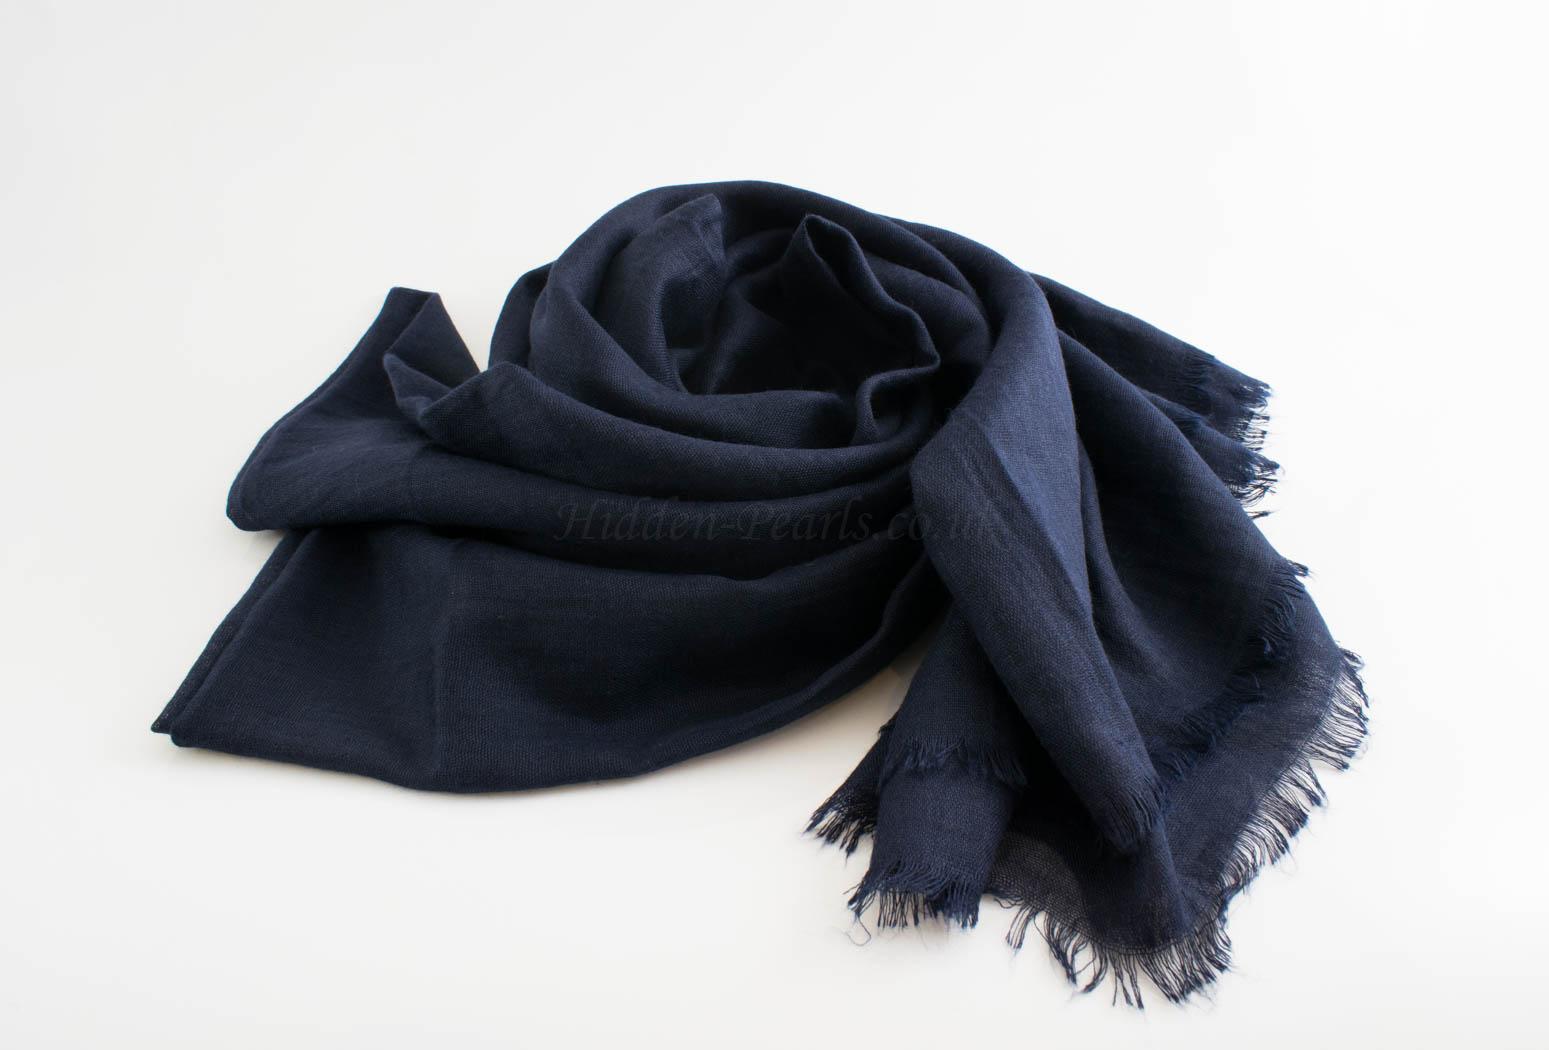 Deluxe Plain Hijabs - Hidden Pearls - Midnight BlueDeluxe Plain Hijabs - Hidden Pearls - Navy Blue